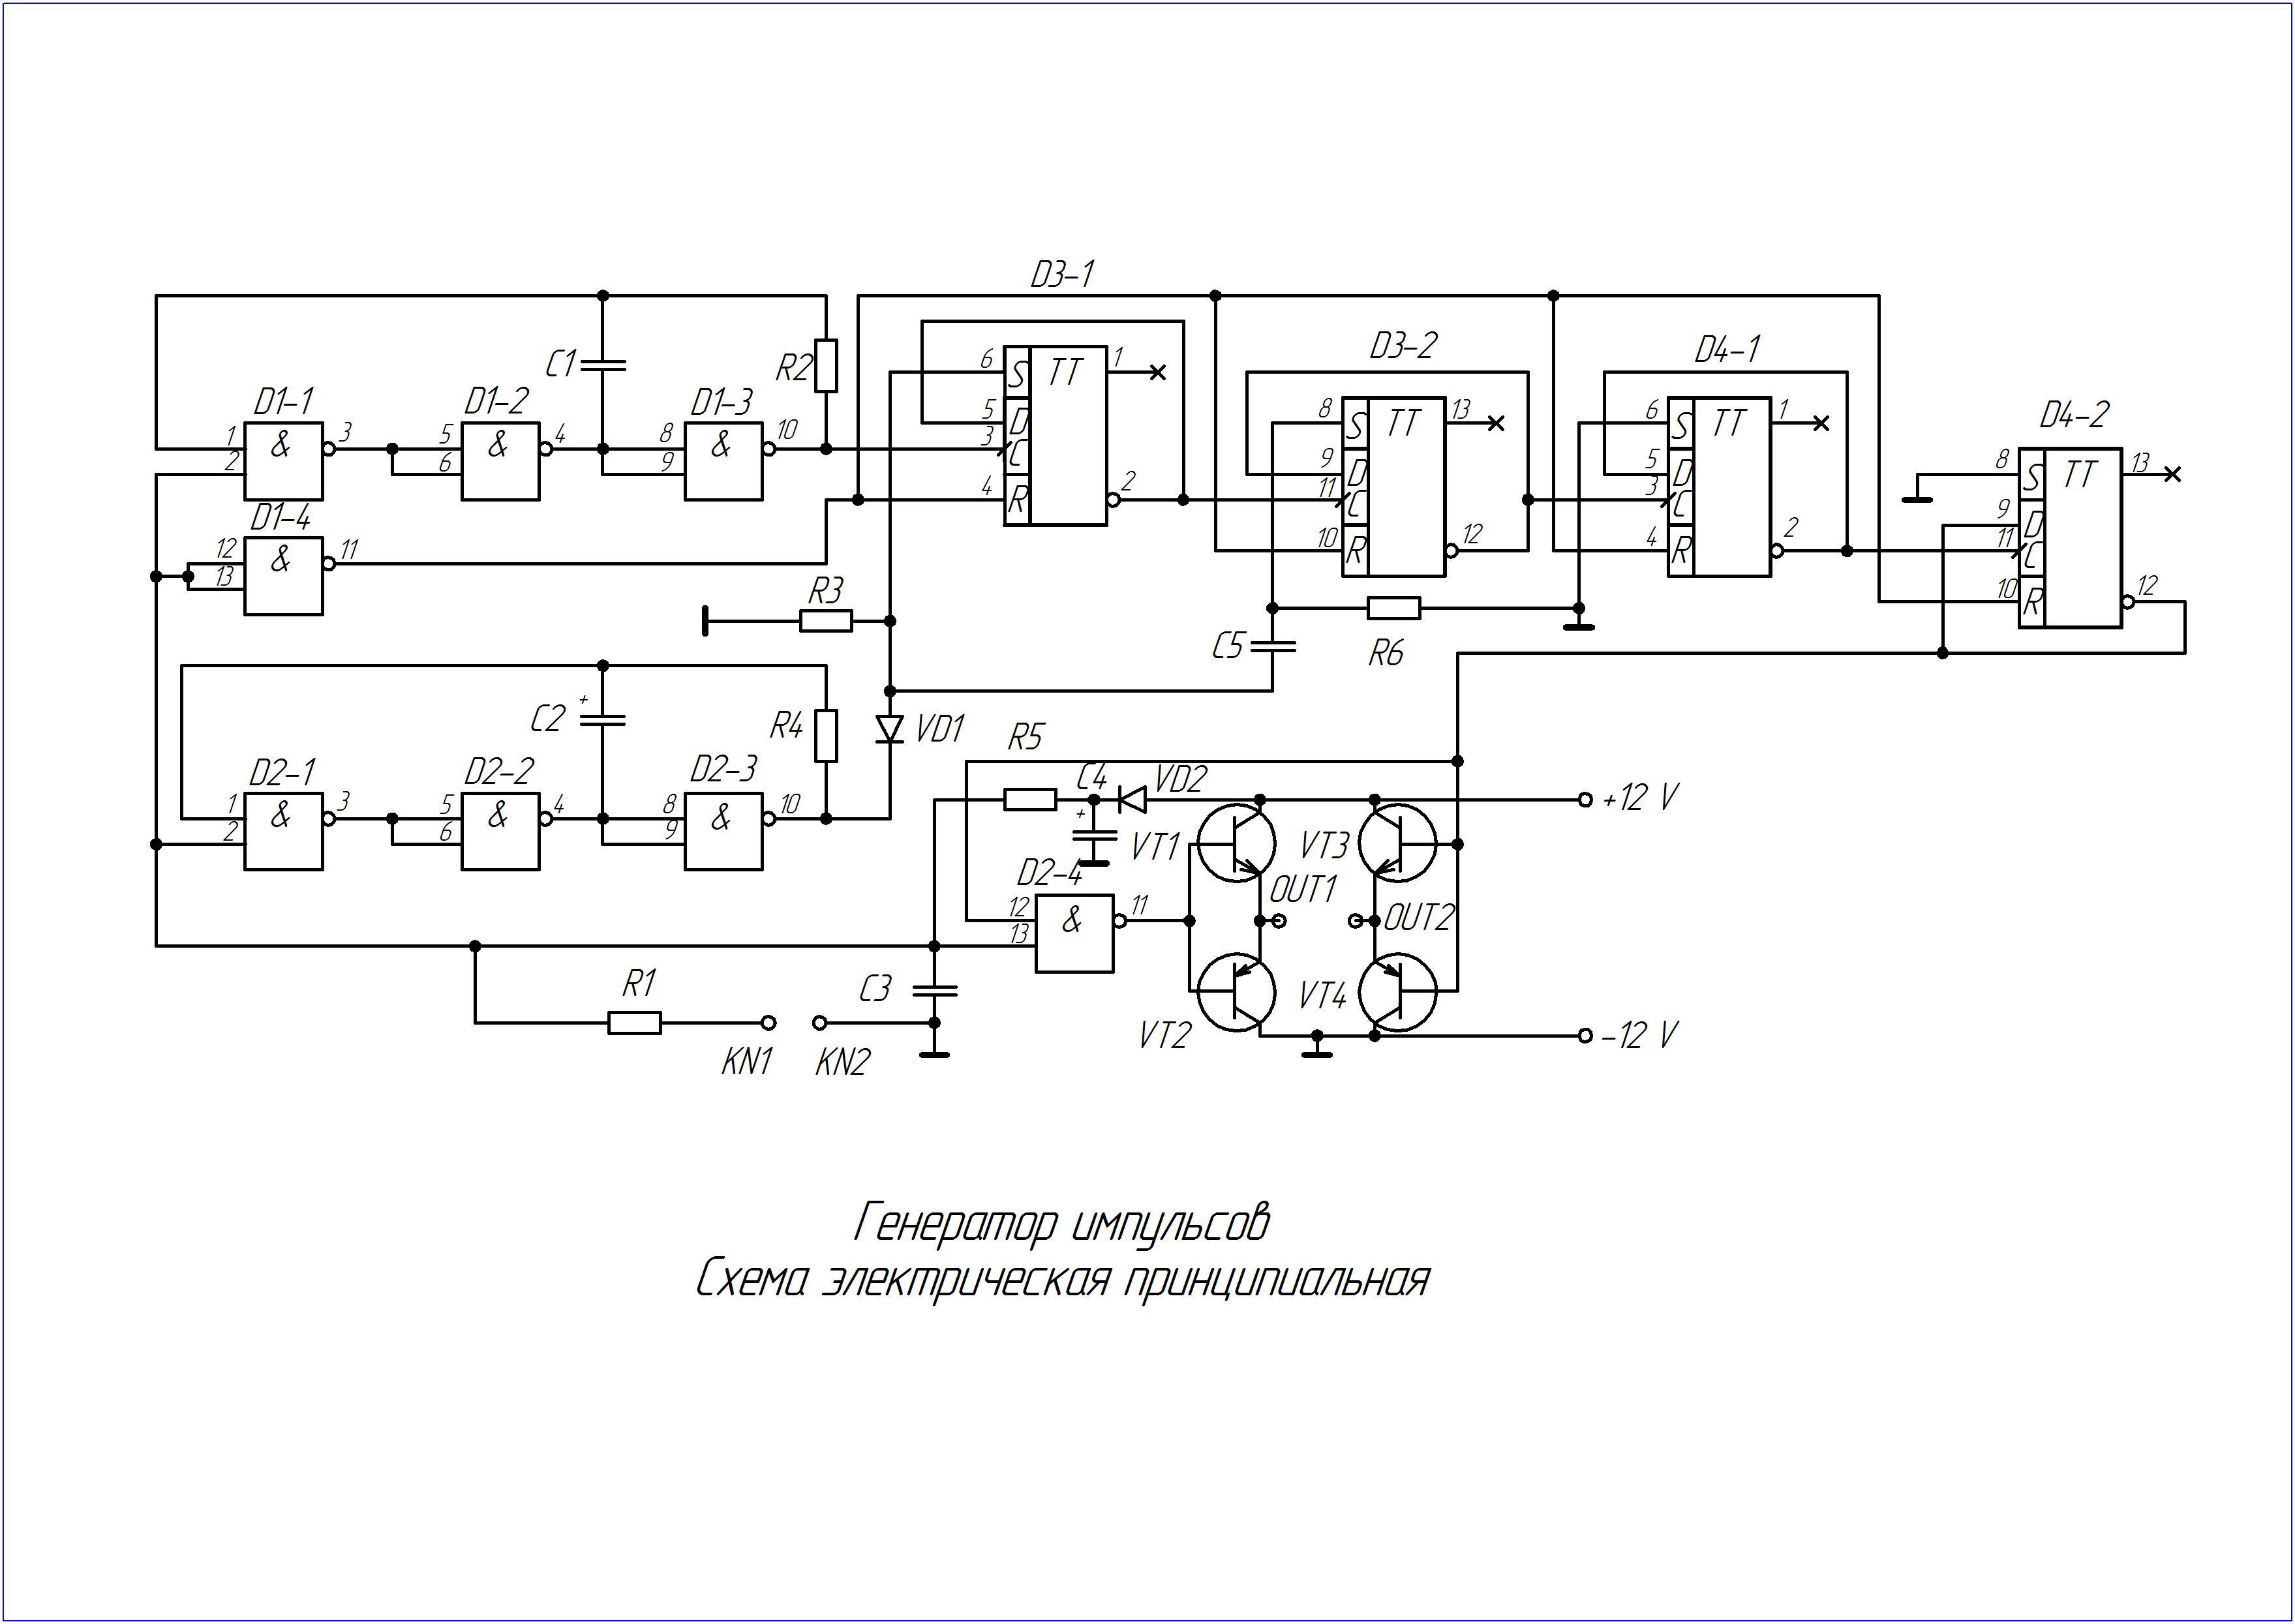 Пример схем электрических